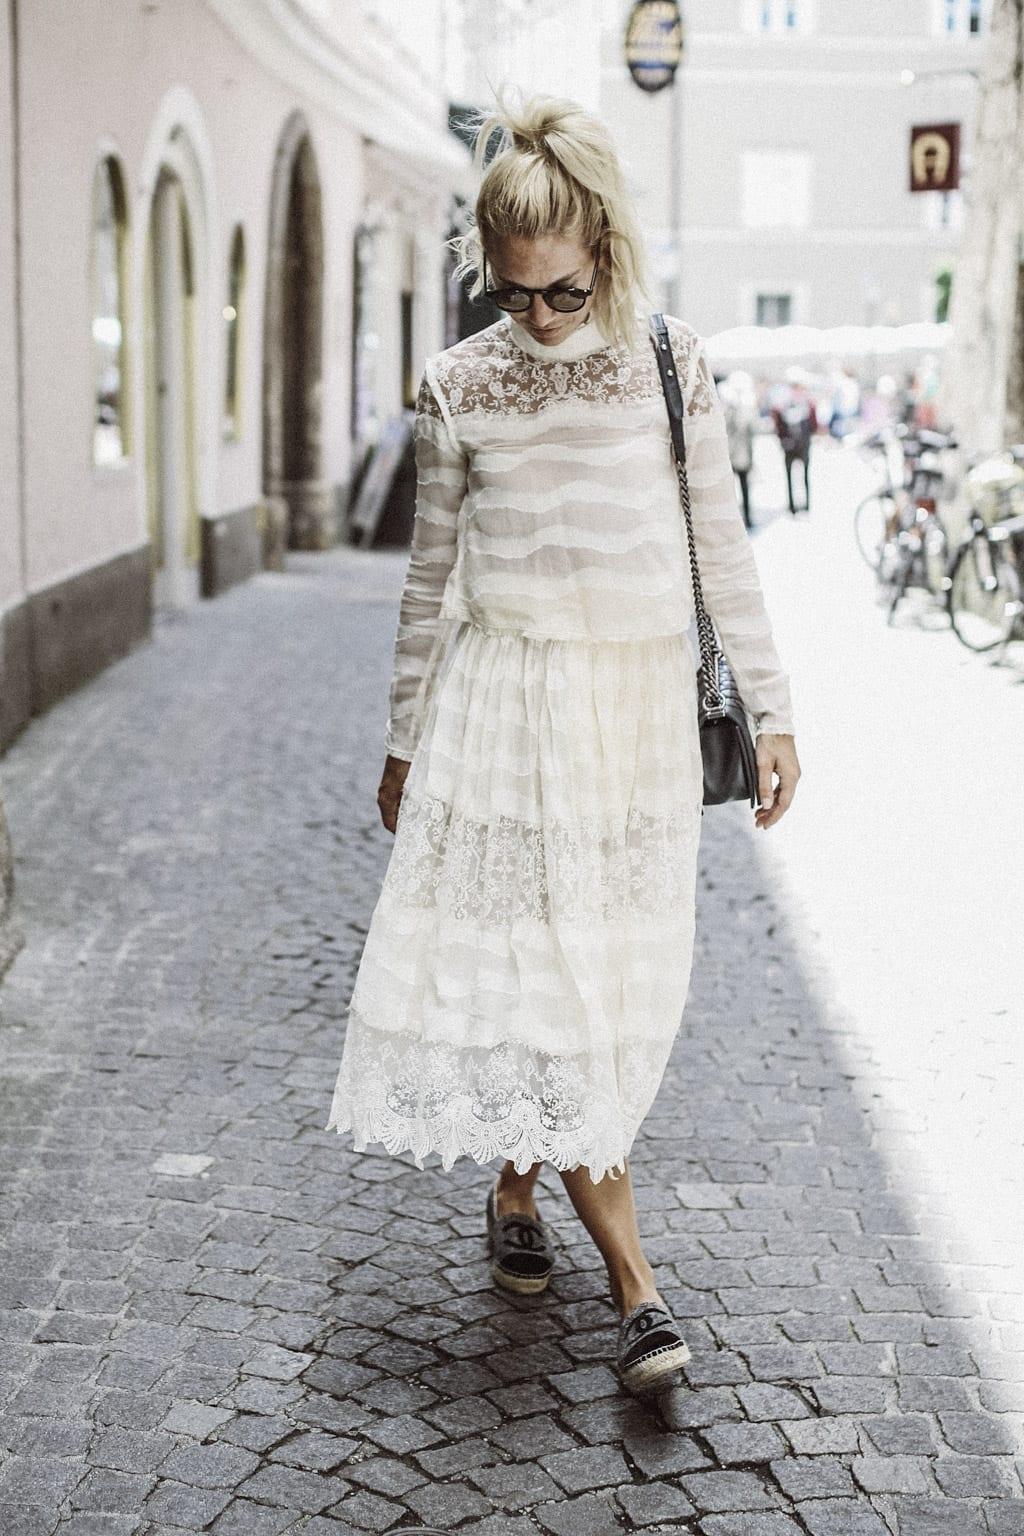 CK-1606-salzburg-austria-fashion-street-style-summer-spring-blog-karin-kaswurm-hm-kleid-2799